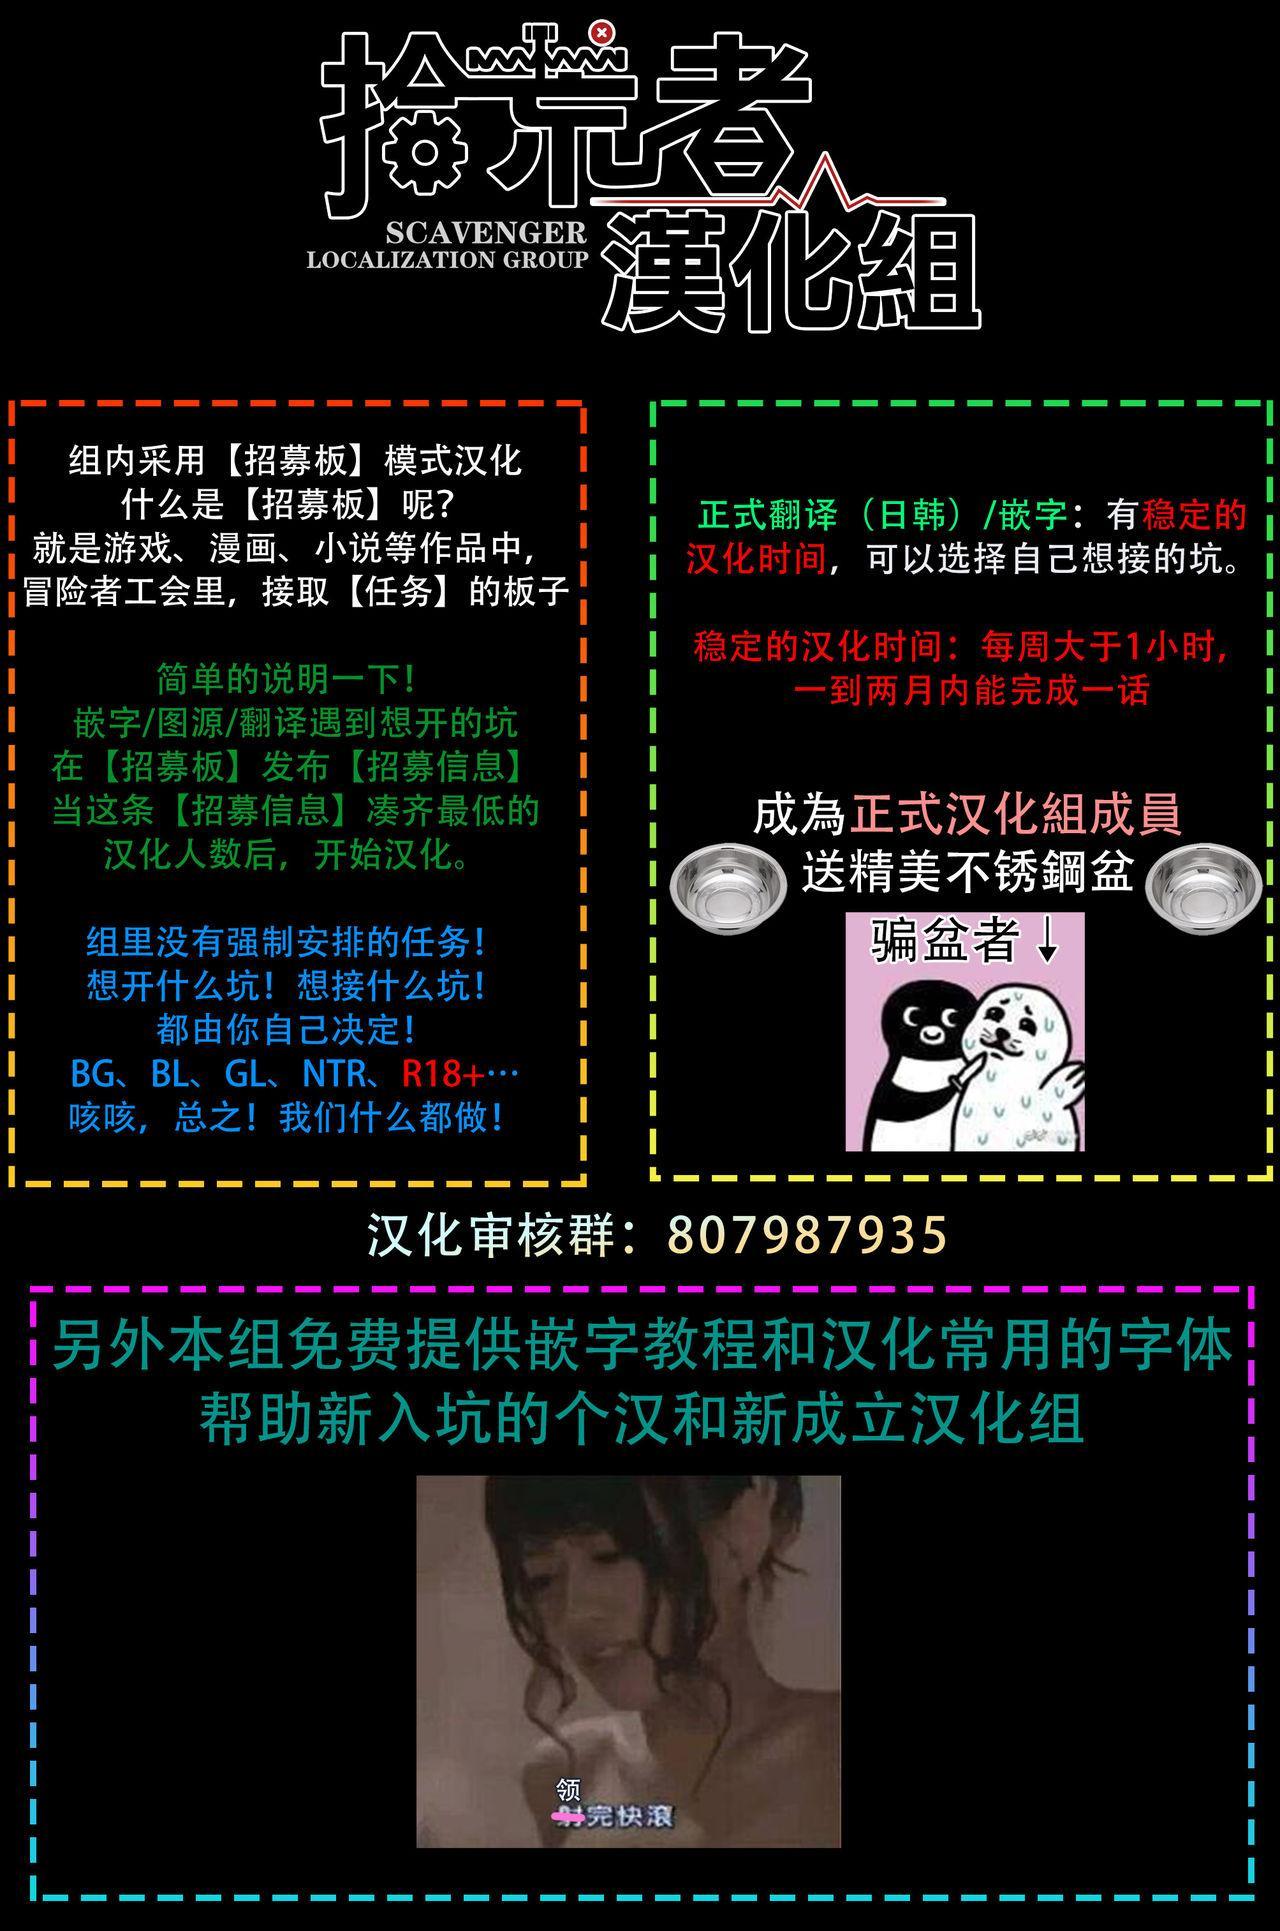 [Utata Hakuto] Houkago Virginity - Virginity afterschool 1-5 完结 [Chinese] [拾荒者汉化组] [Digital] 172